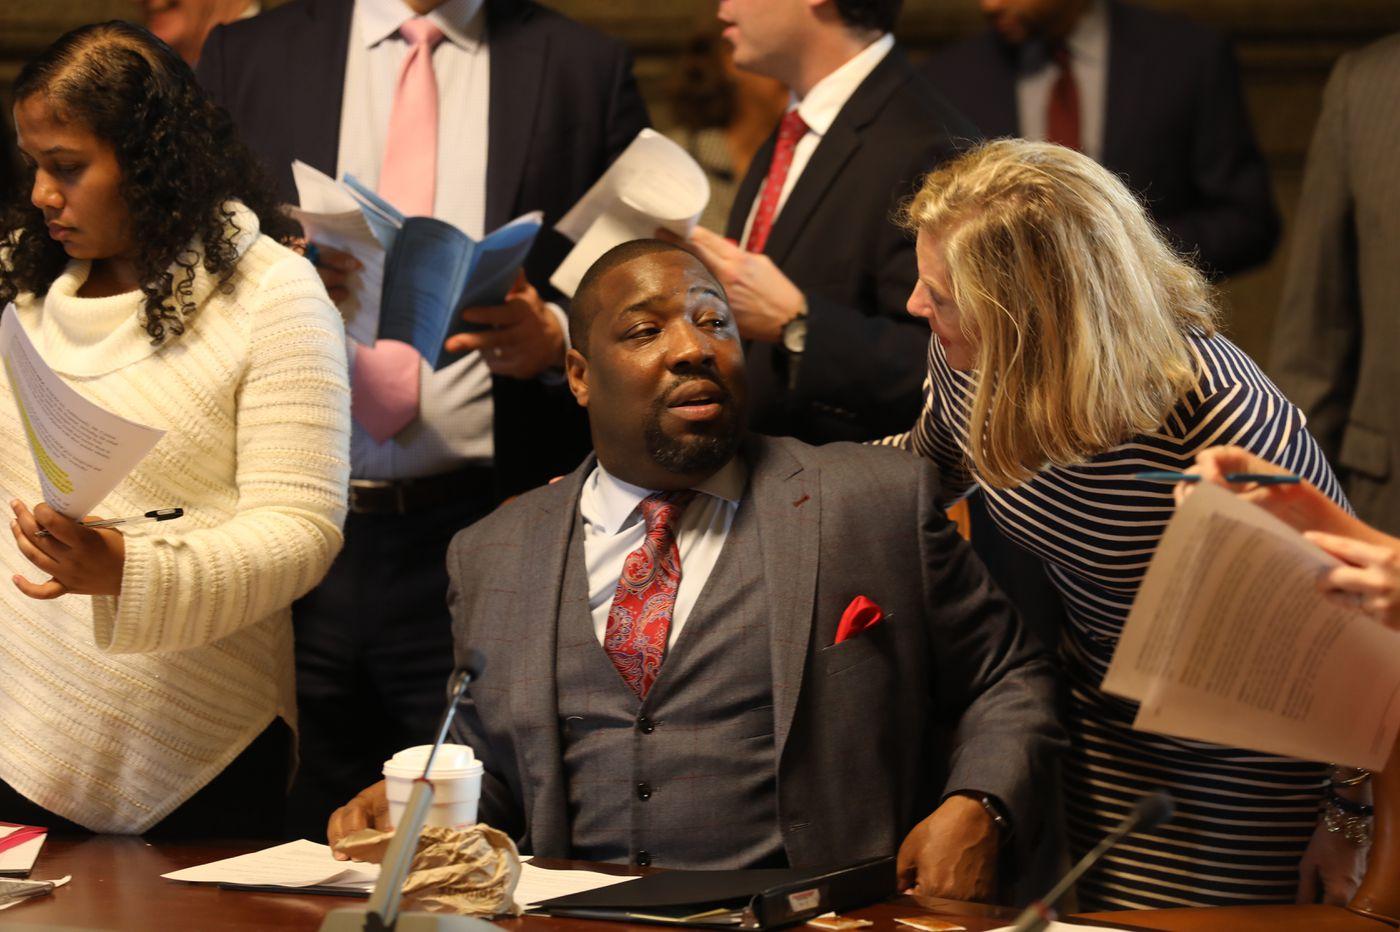 Philadelphia Councilman Kenyatta Johnson helped friend make $165,000 flipping city-owned lots